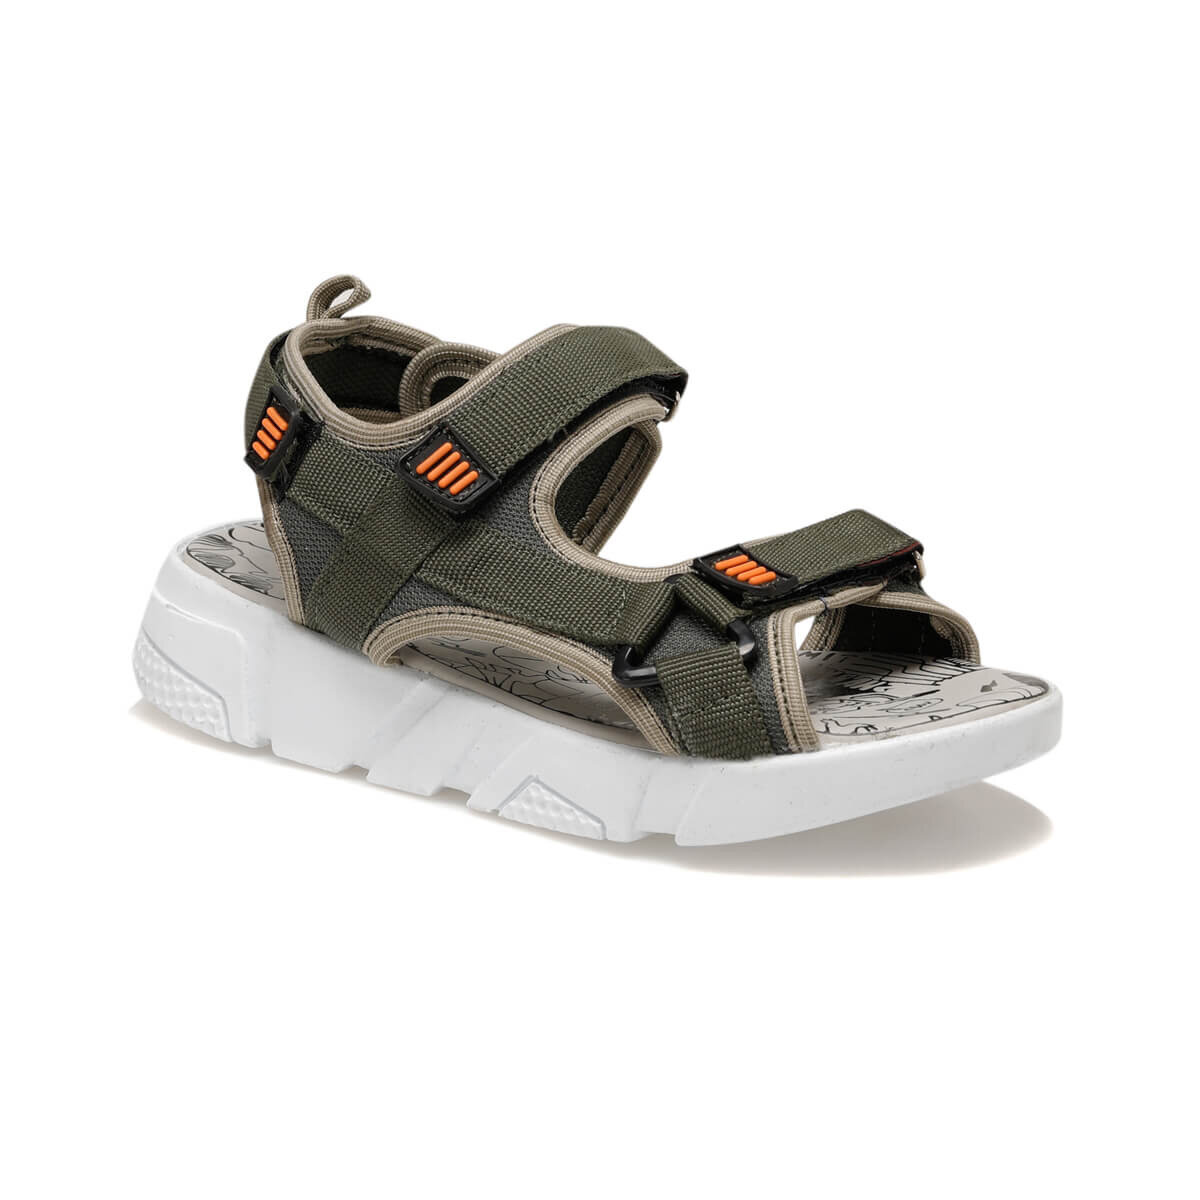 FLO 91.511216.G Green Male Child Sports Shoes Polaris